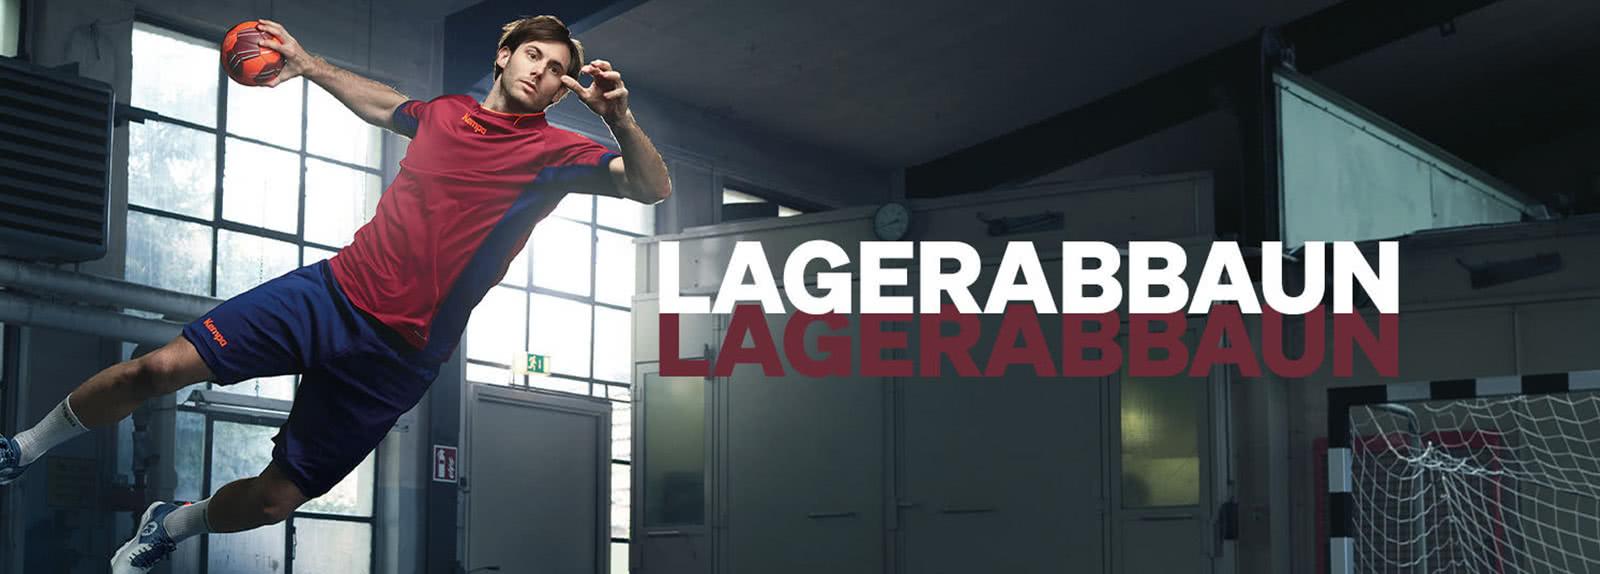 lagerabbaun handball